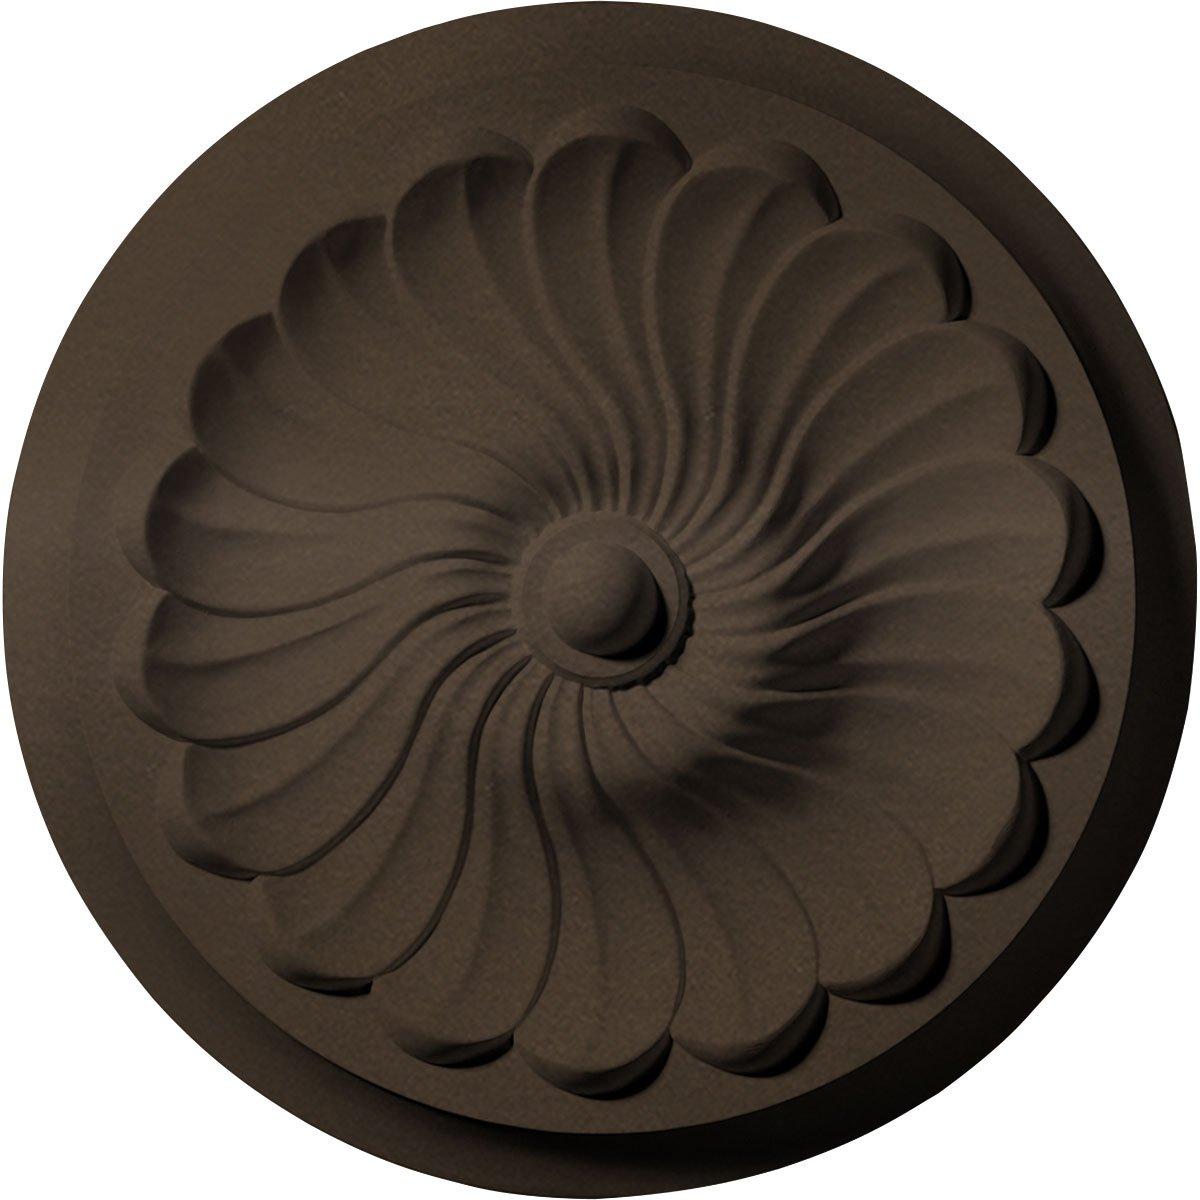 Ekena Millwork CM12FLBZS Ceiling Medallion 12 OD x 2 1/4'' P Flower Spiral (fits Canopies up to 2''), Bronze